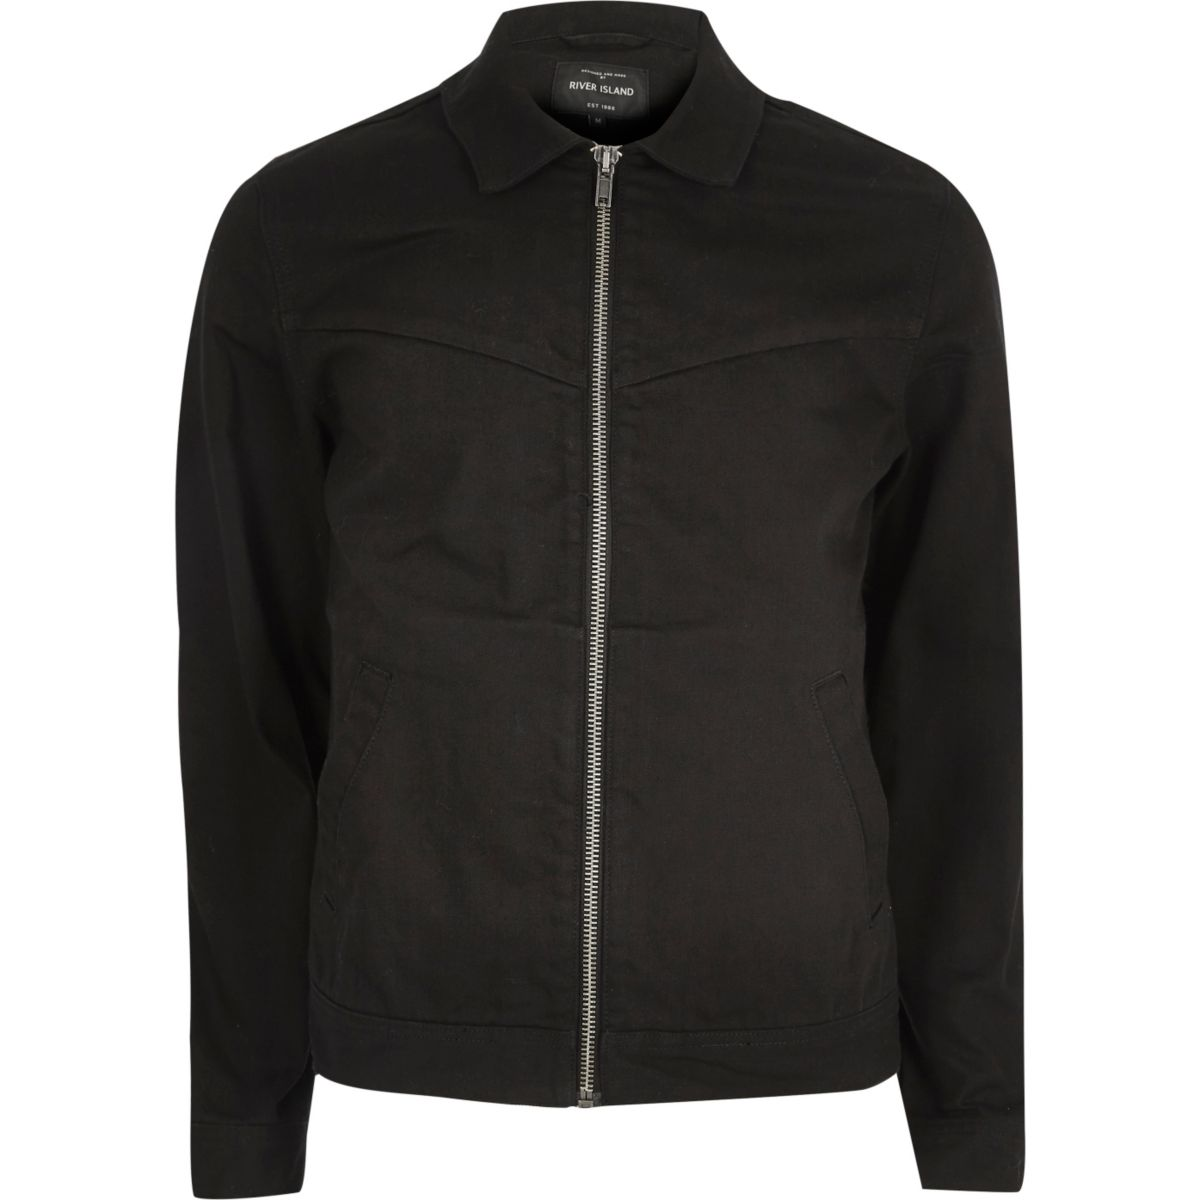 Black western harrington jacket